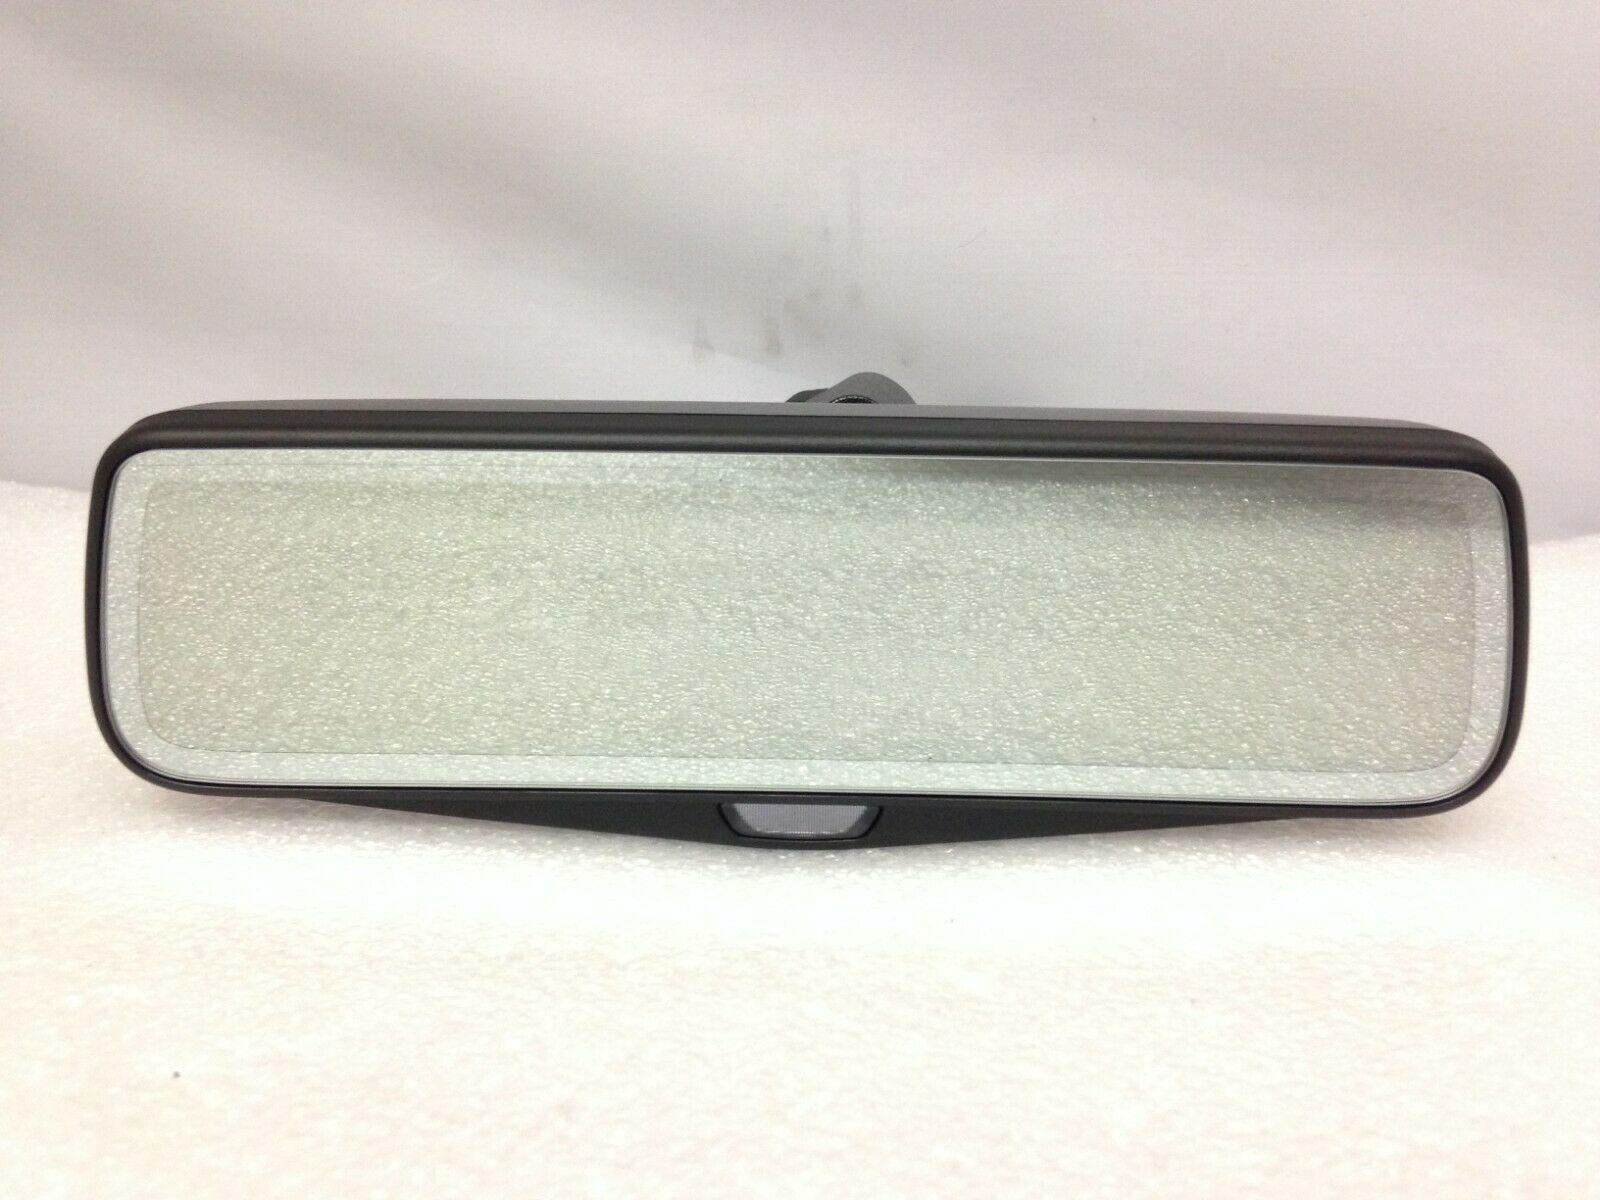 GM 2016+ rear view mirror with Auto-Dim